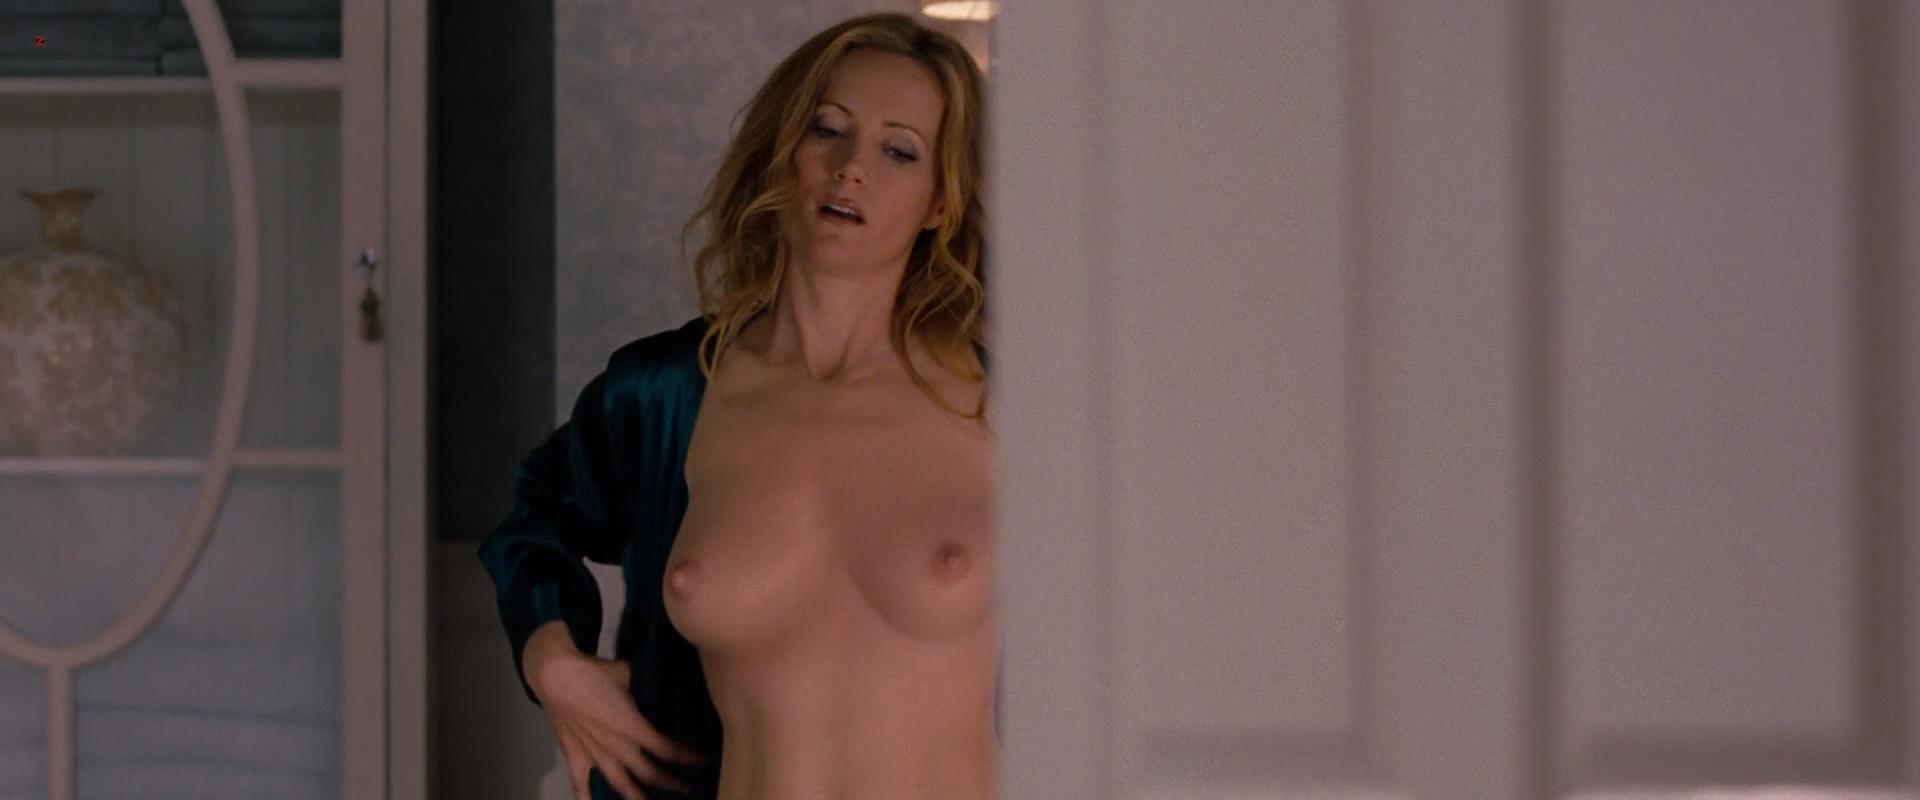 Mircea monroe topless